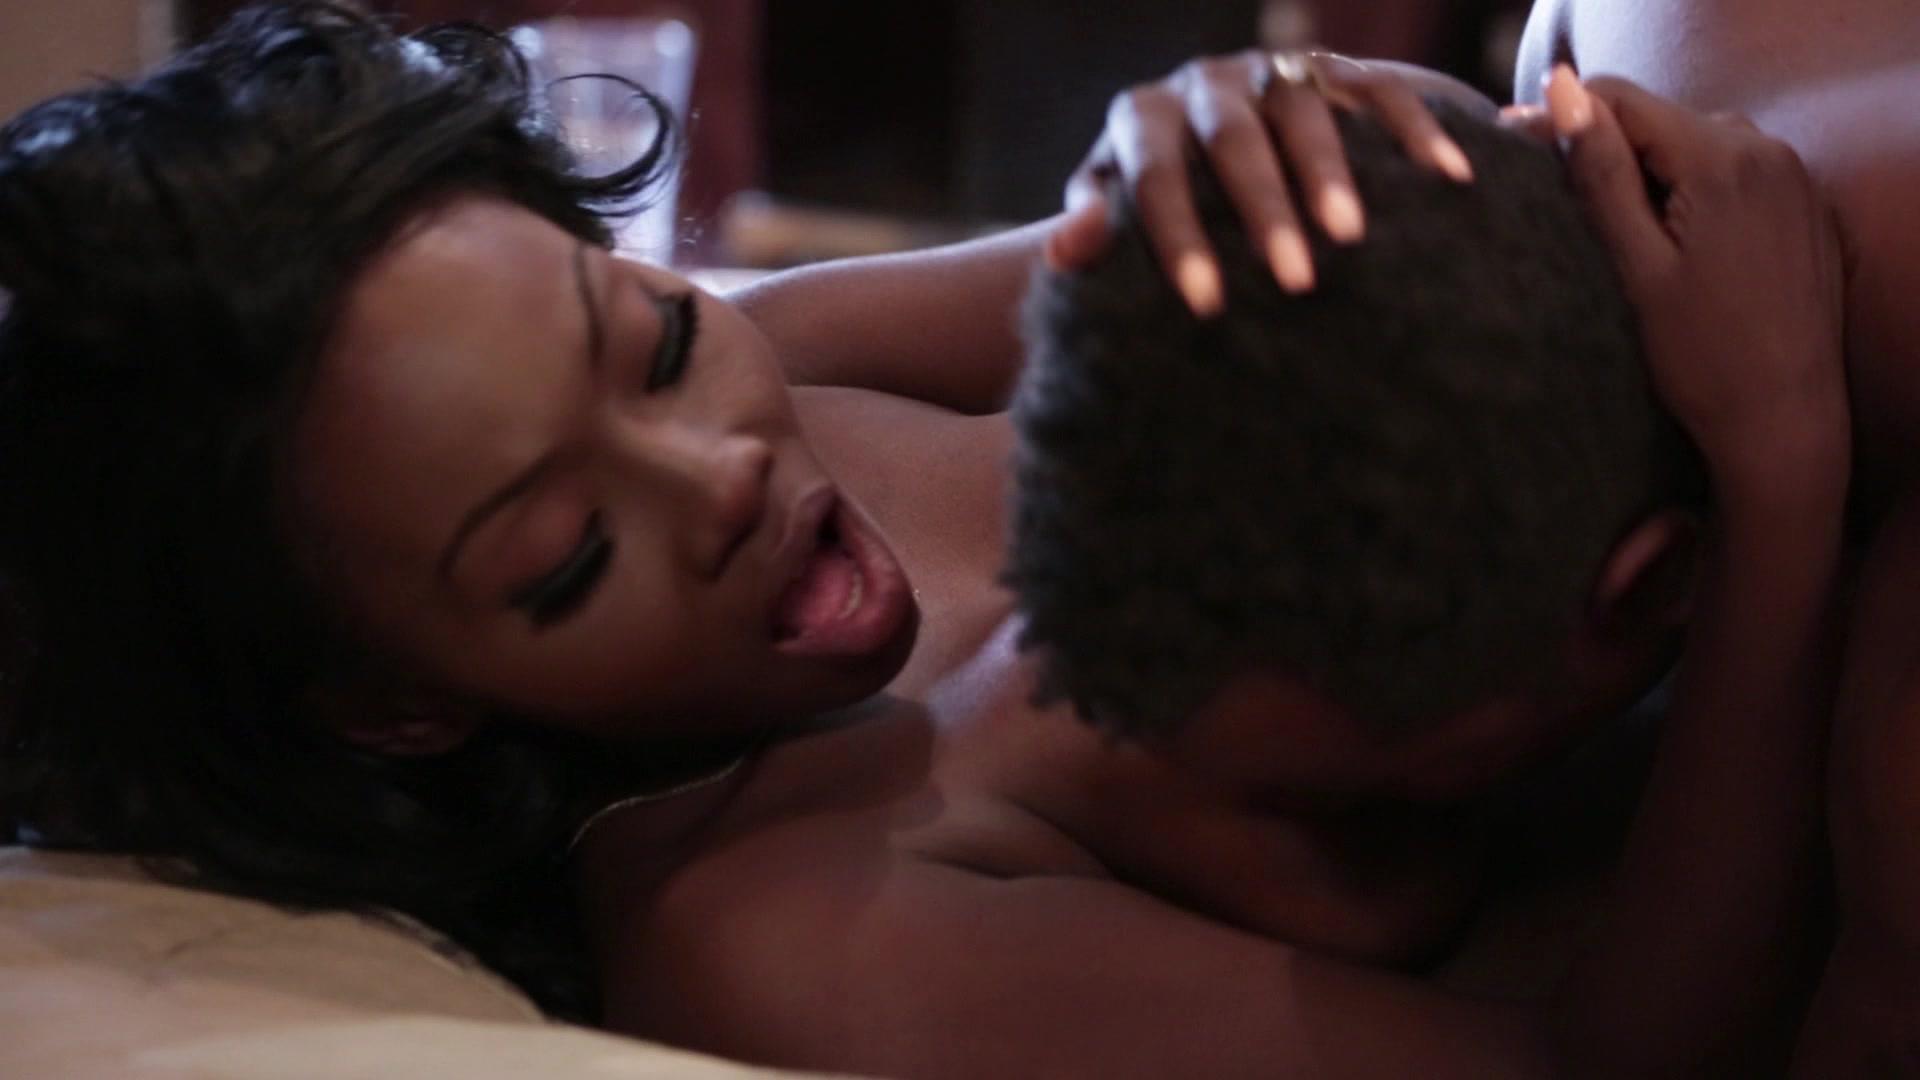 Interracial sex scene